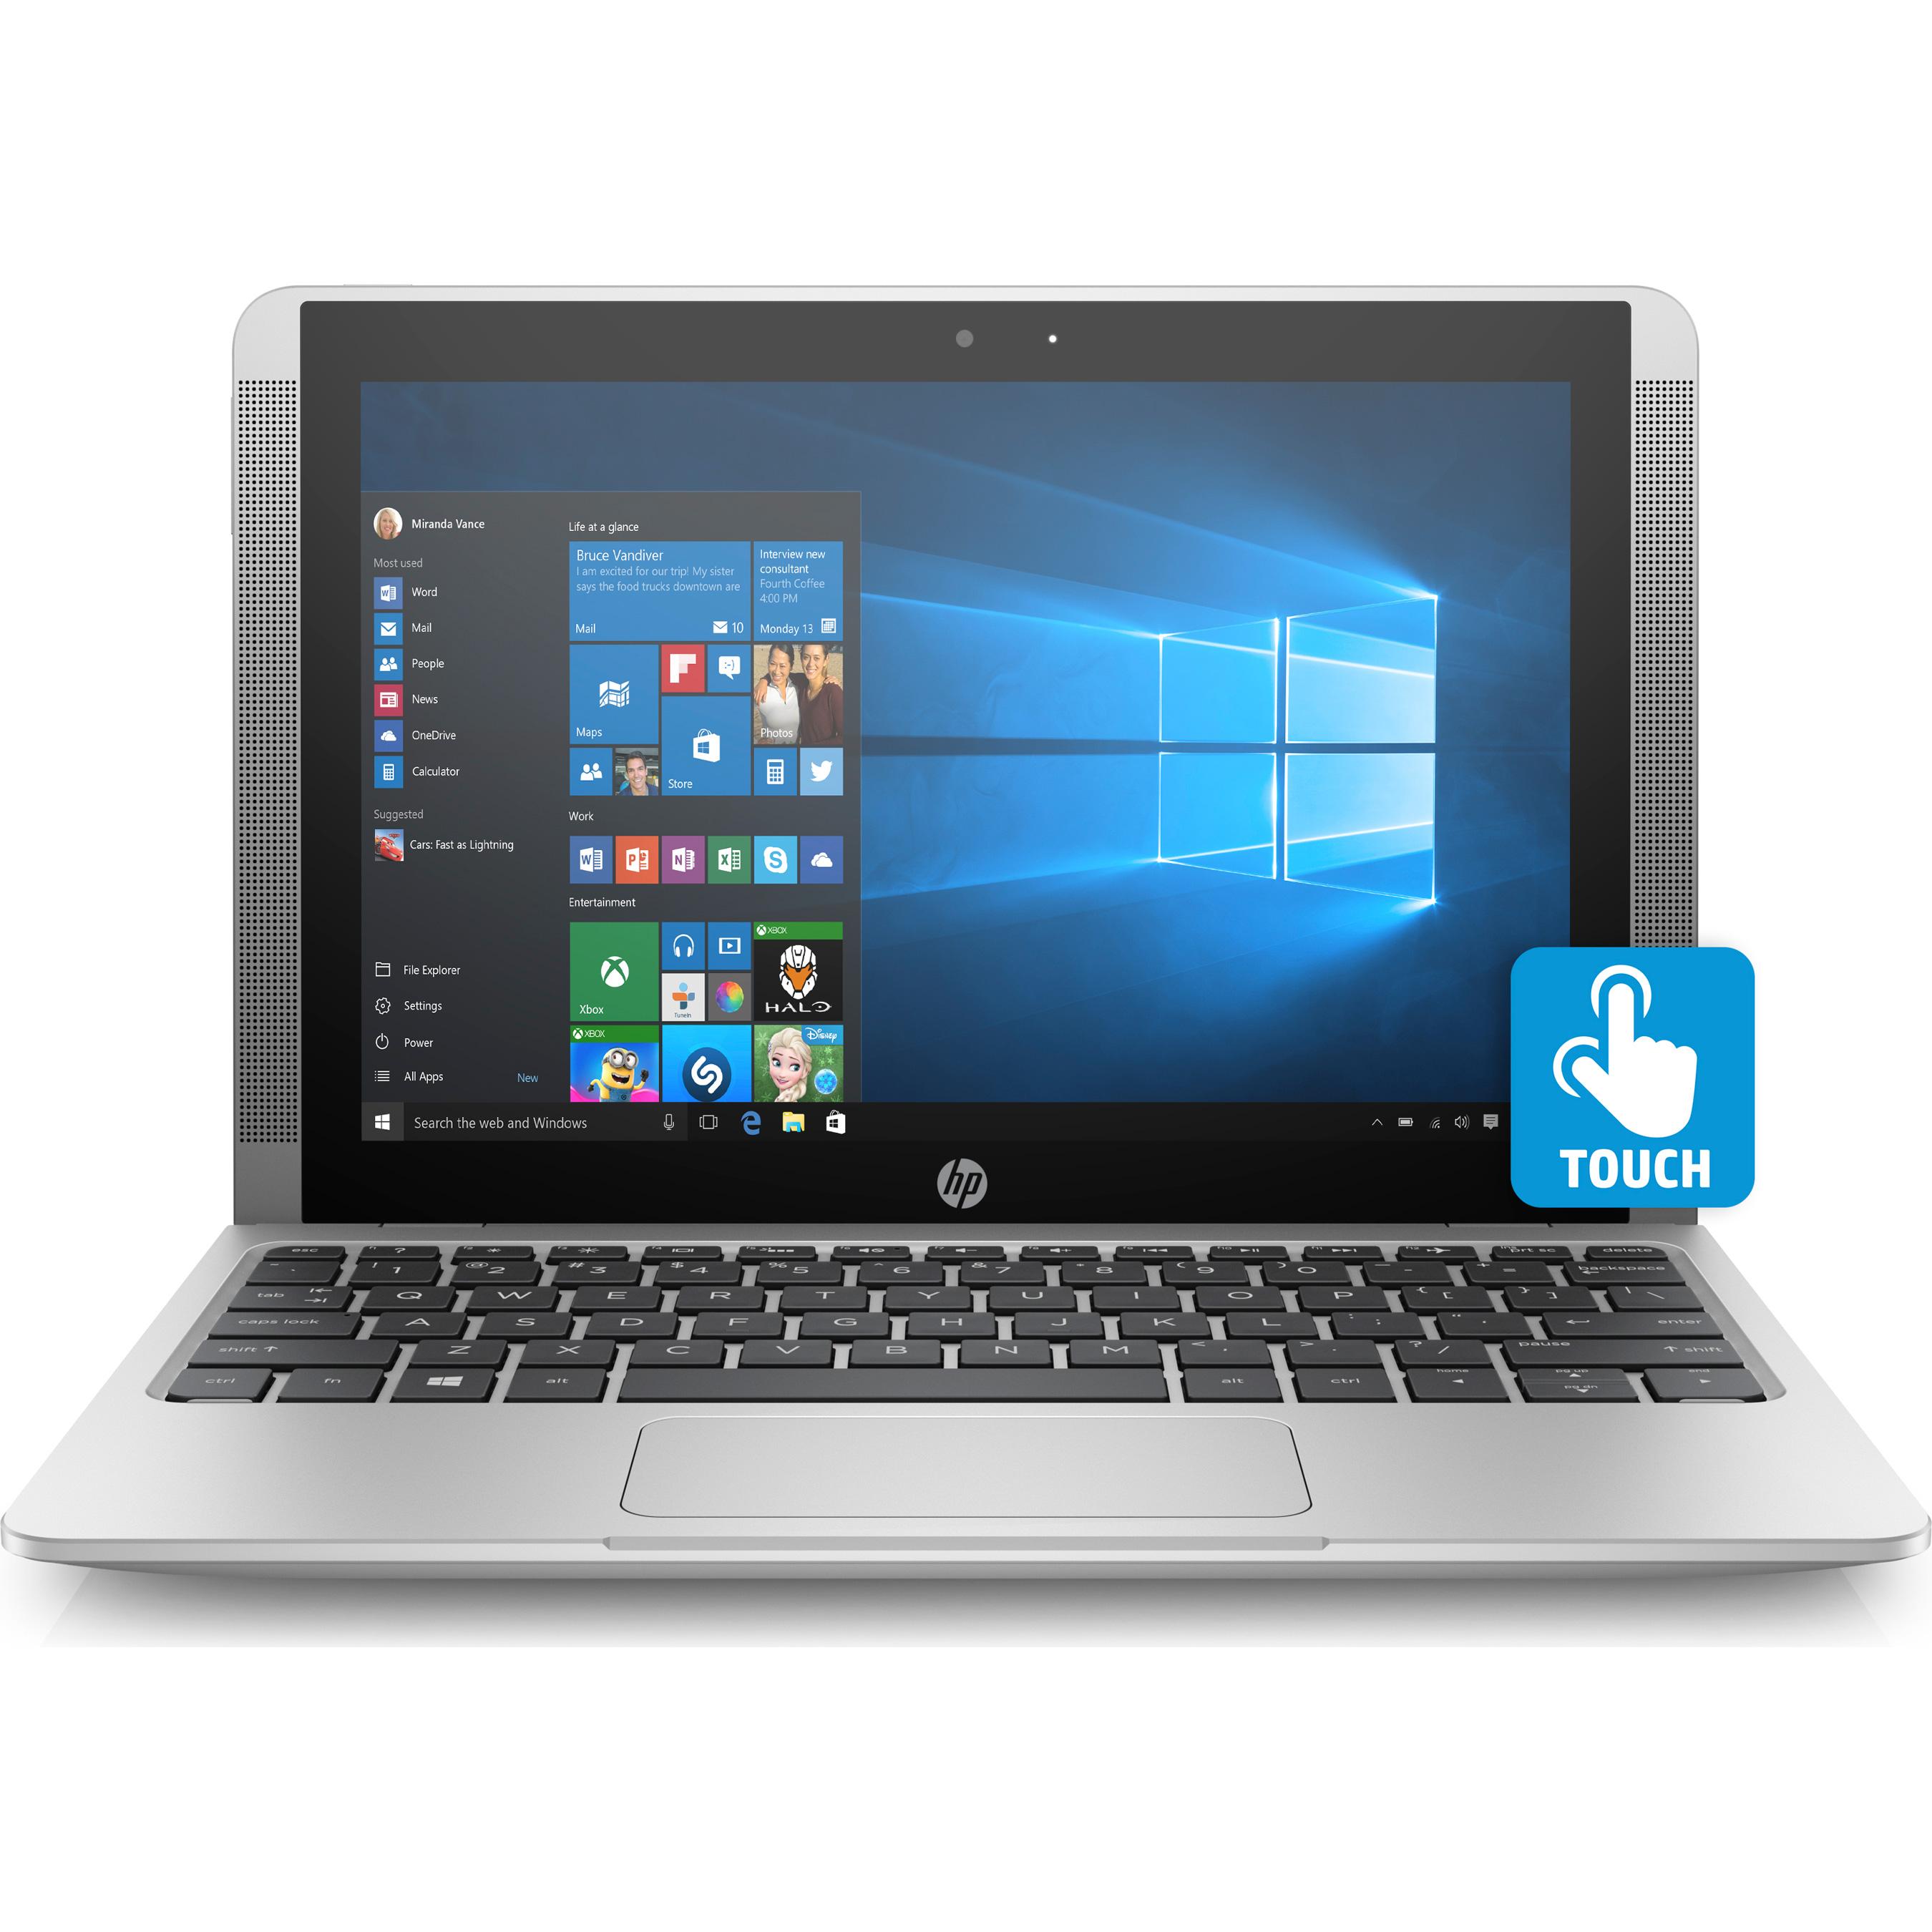 "Hewlett Packard x2 Detachable 10-p020nr 10.1"" Multitouch ..."